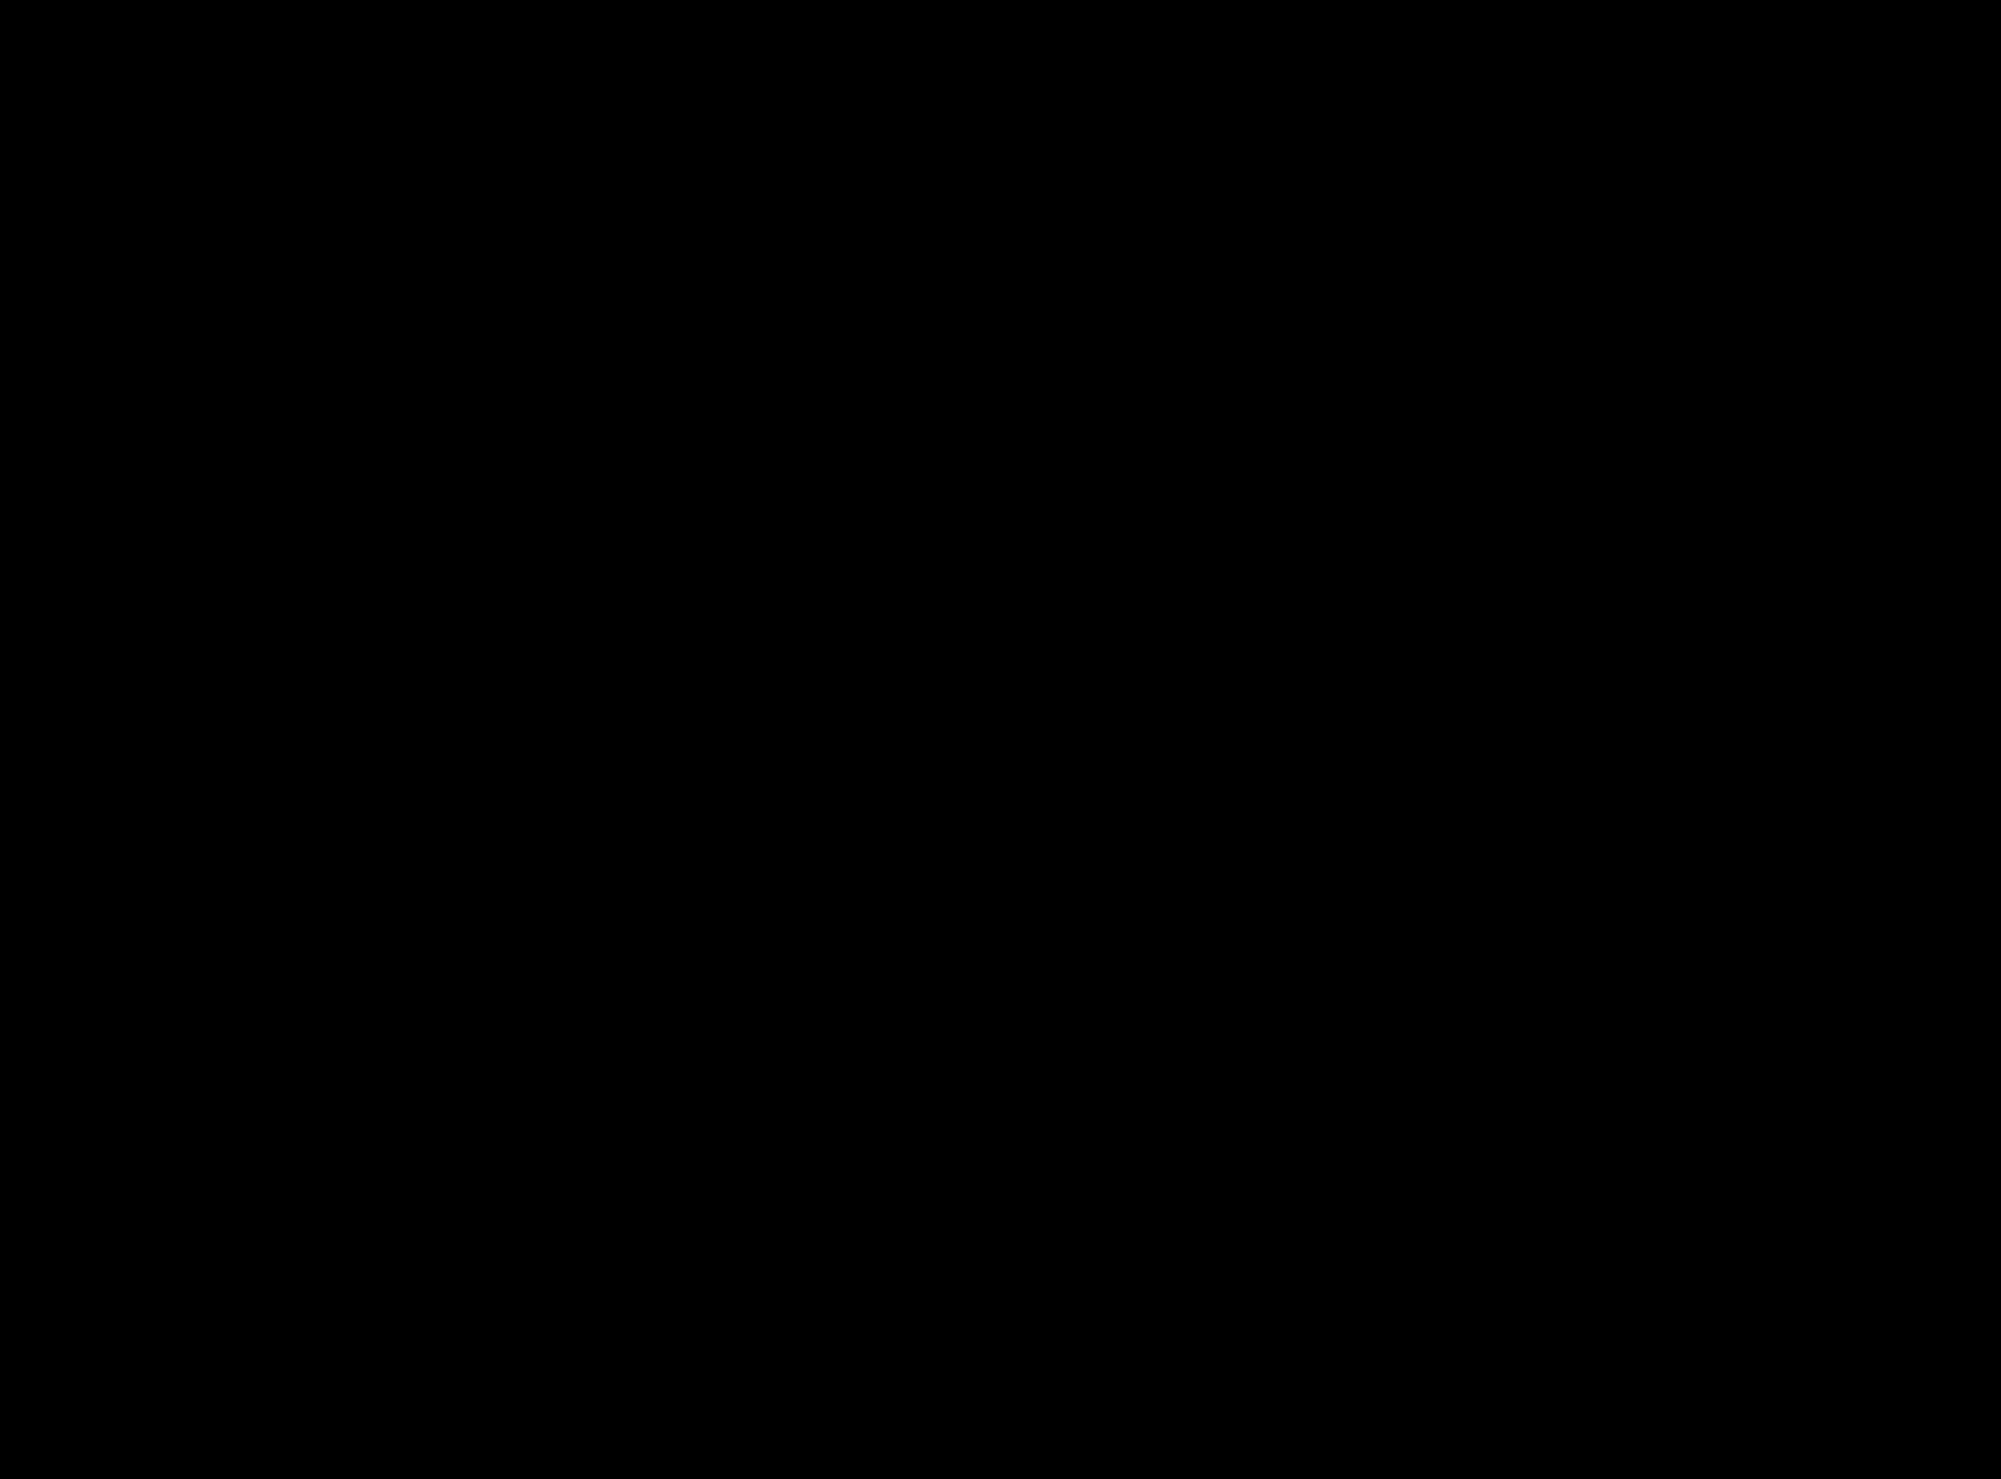 graphic transparent Transparent splash small. Black ink png clipart